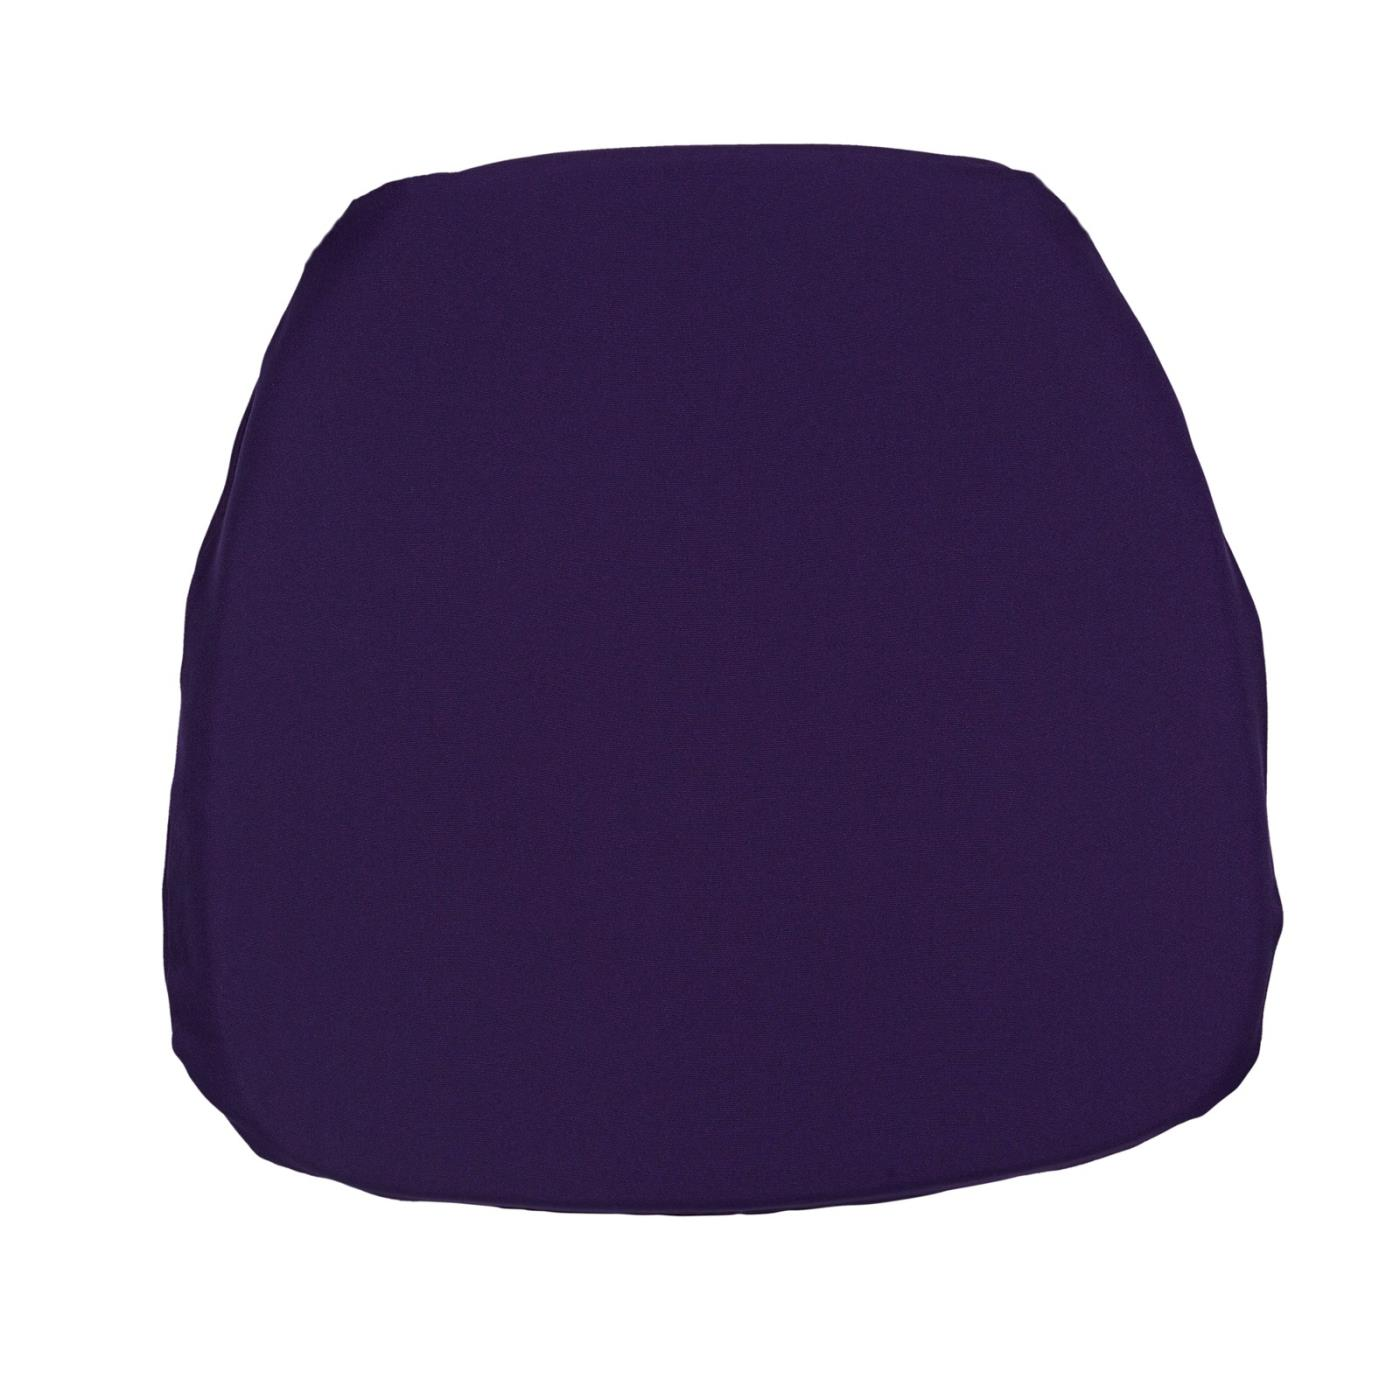 Poly Seat Cushion - Purple